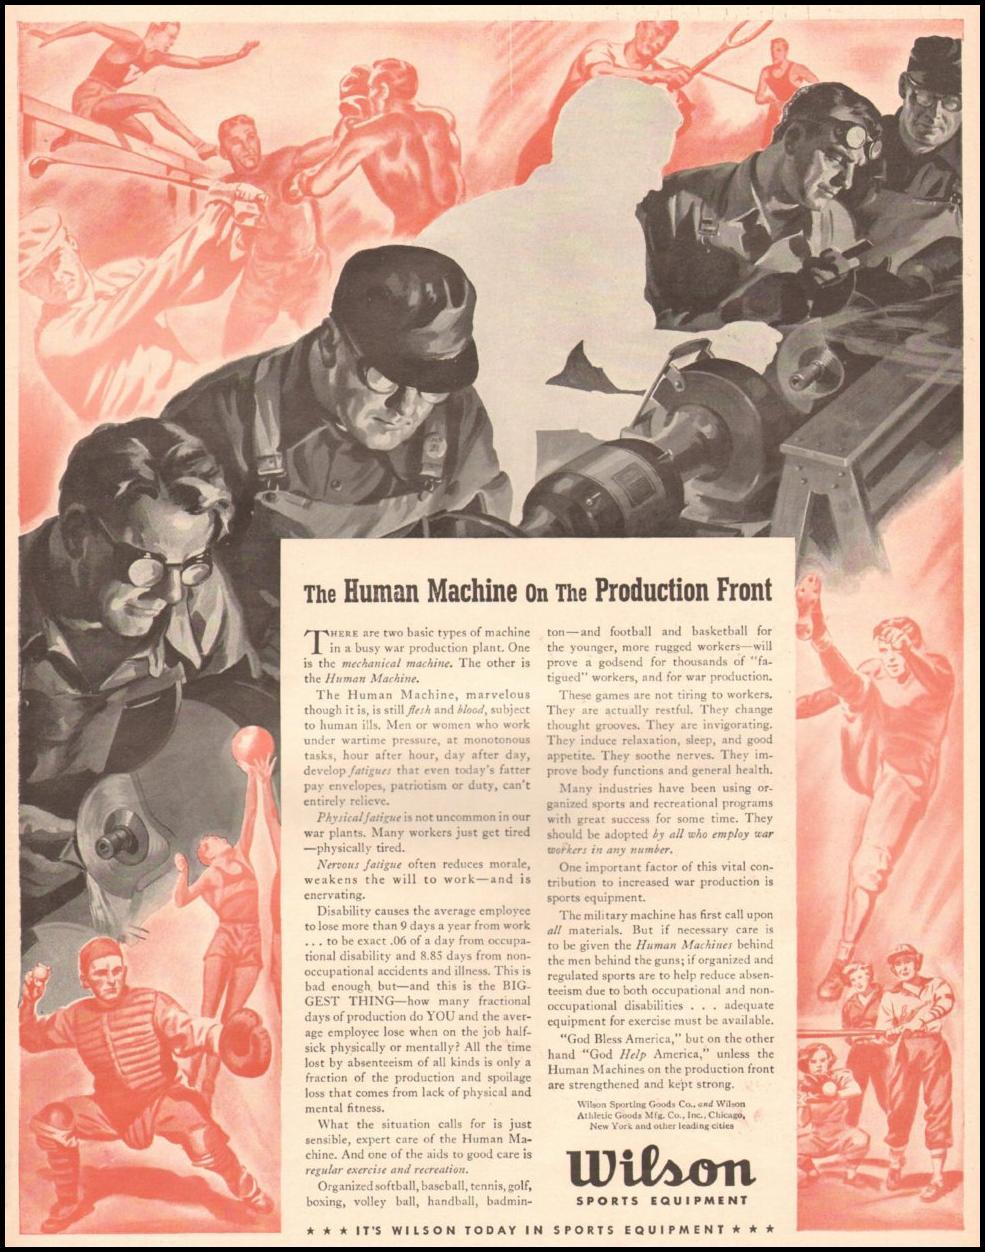 WILSON SPORTS EQUIPMENT LIFE 06/22/1942 p. 57